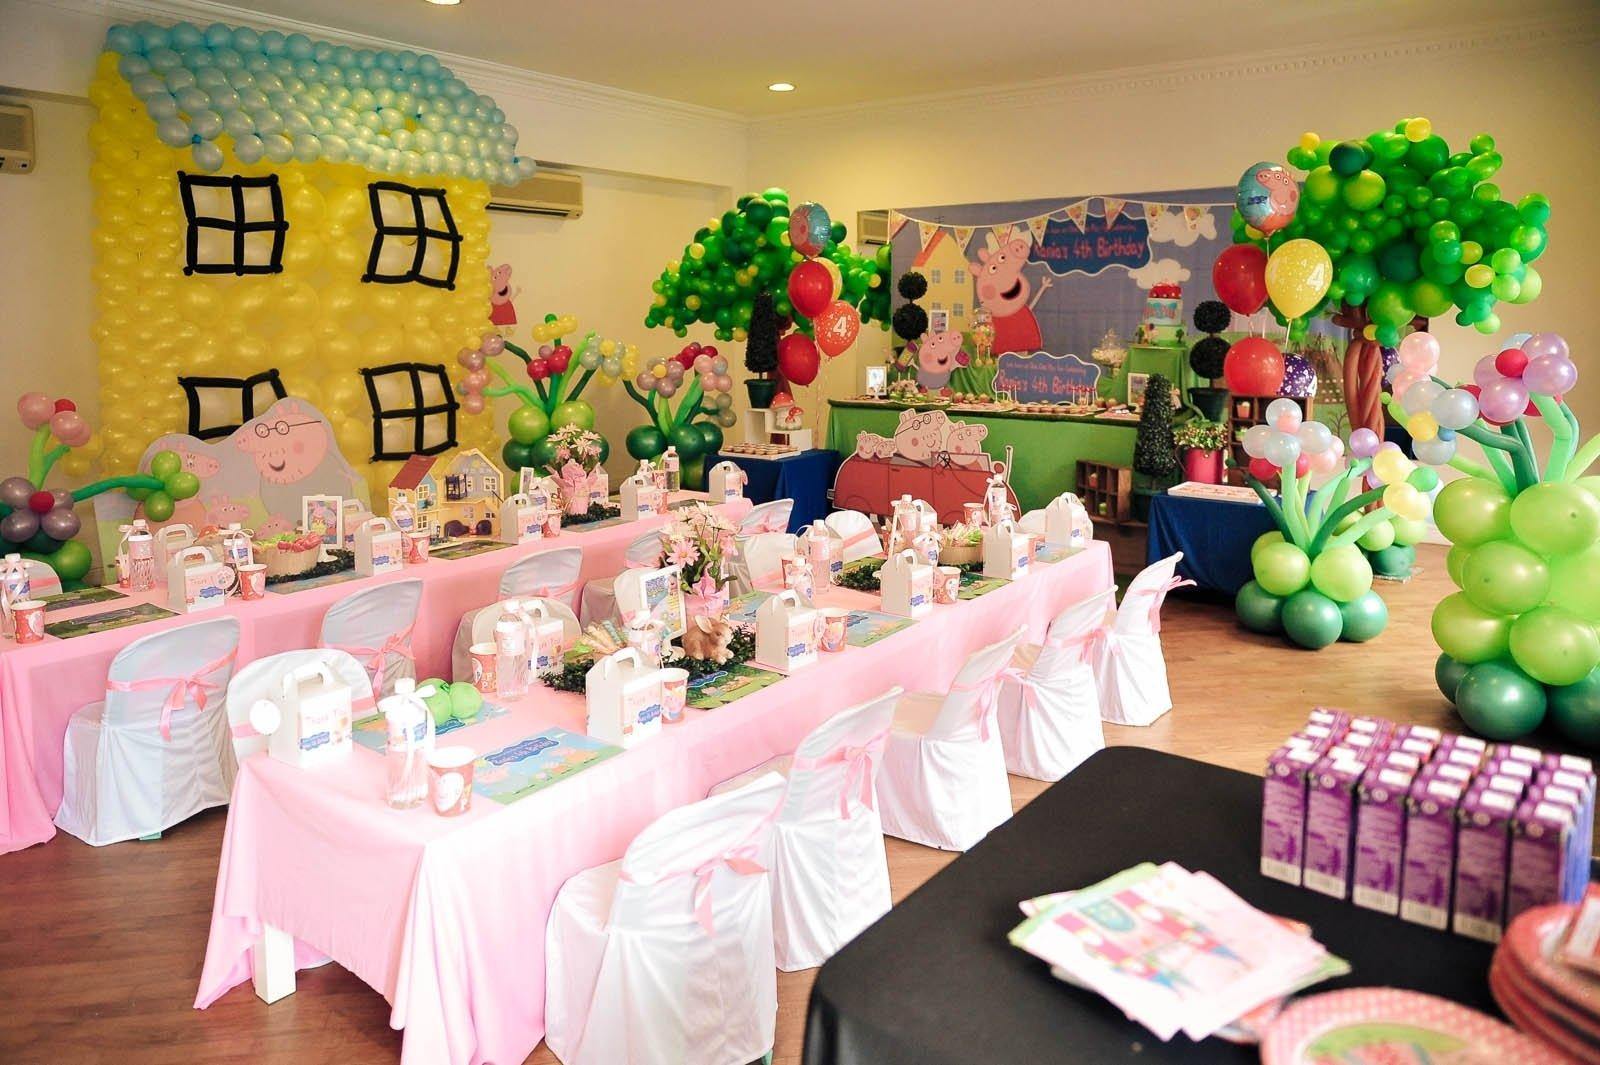 10 Unique Peppa Pig Birthday Party Ideas theme peppa pig abby creative designsabby sue backdrops 2021